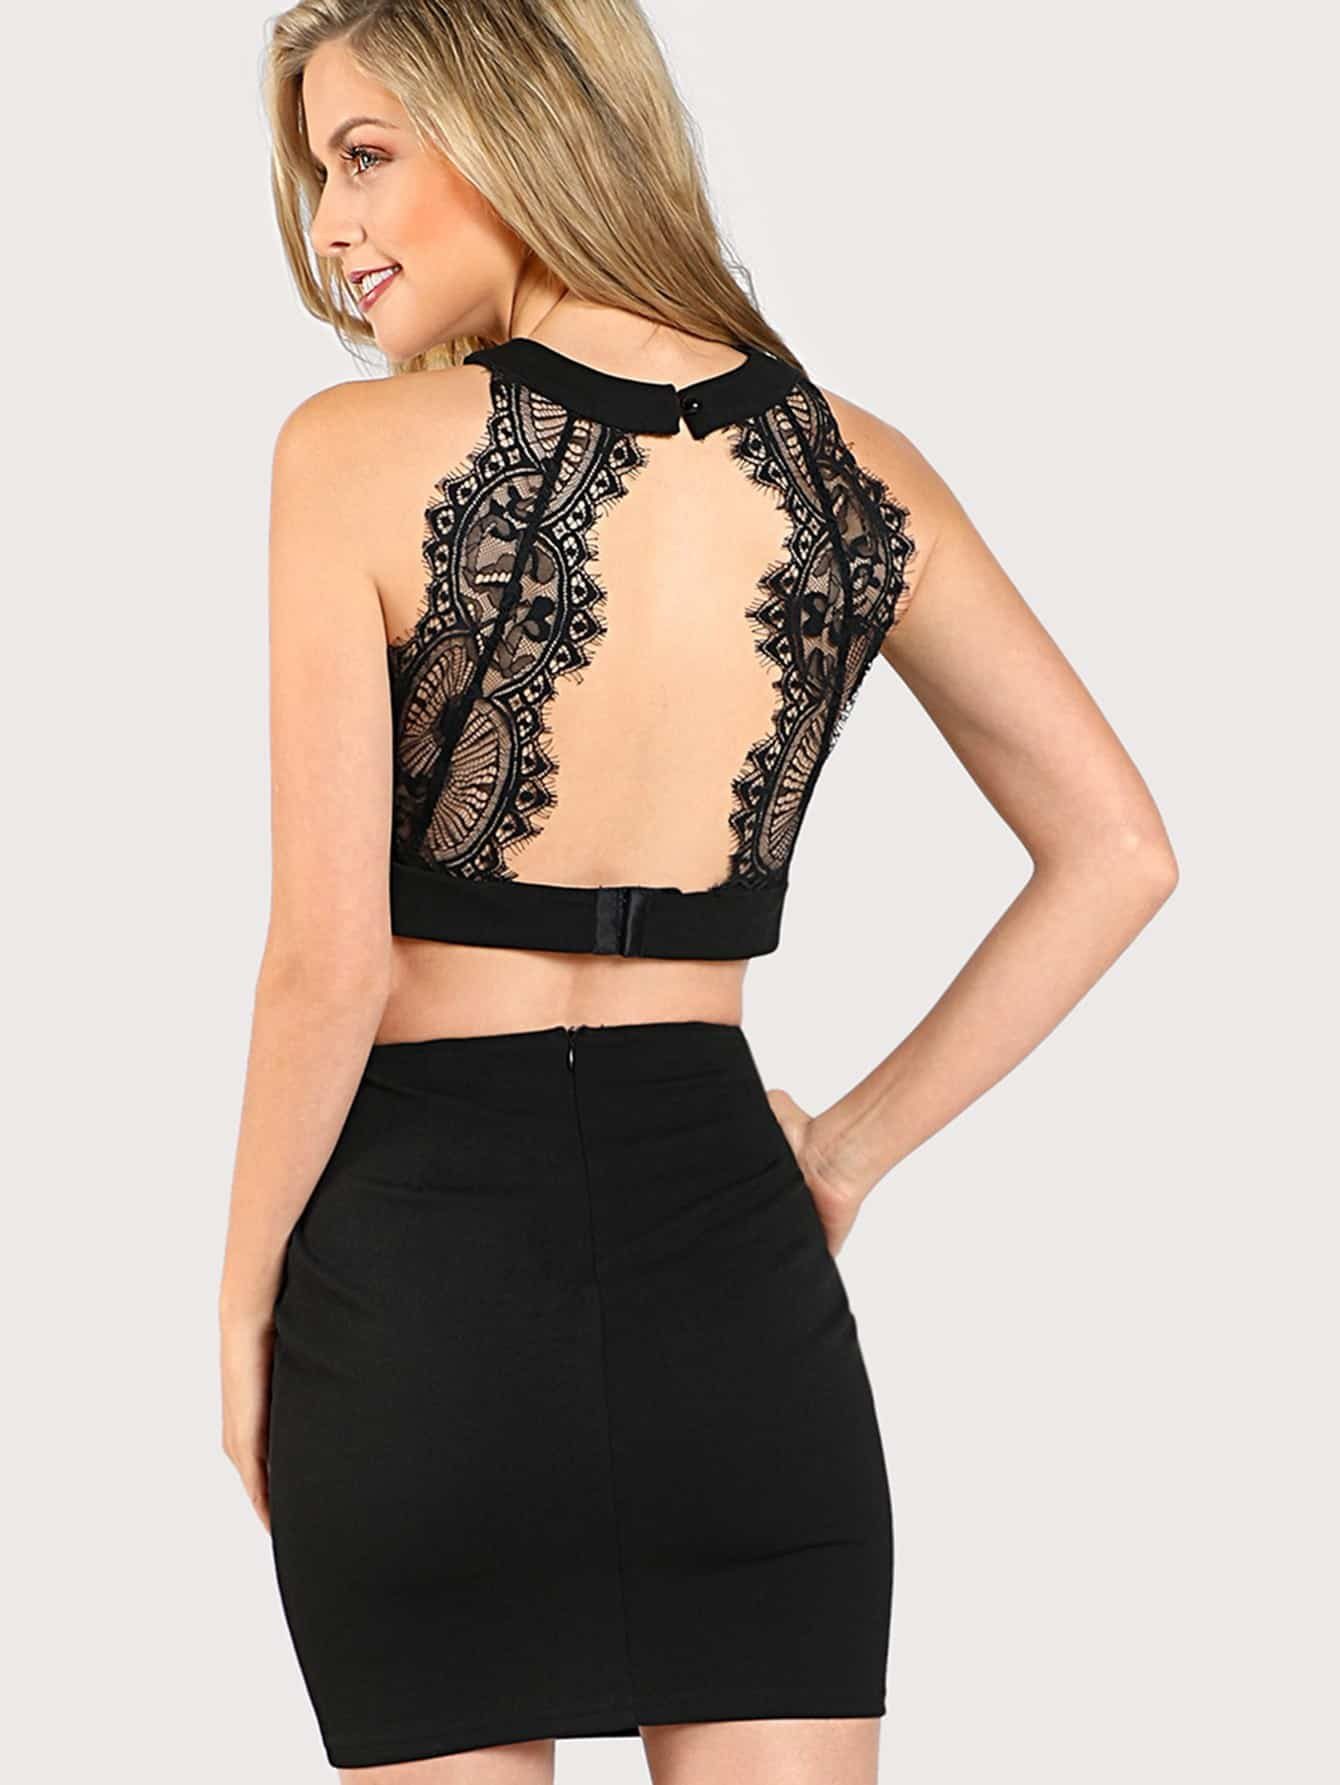 Eyelash Lace Open Back Crop Top & Bodycon Skirt Set